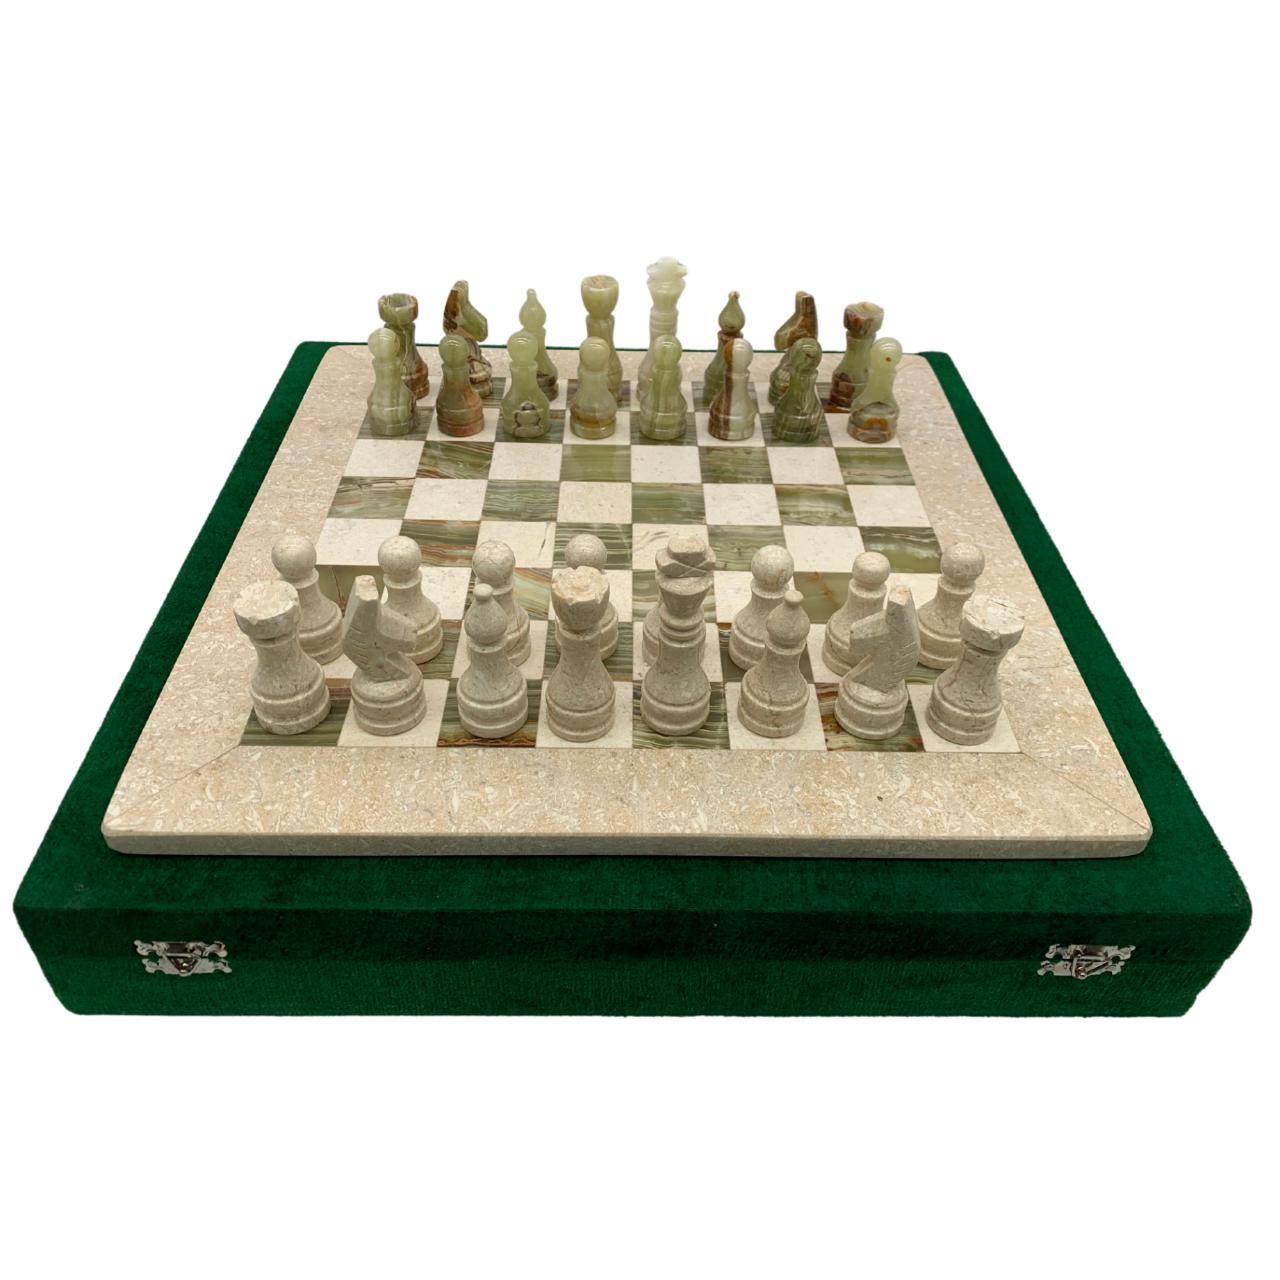 "16"" Onyx Marble Chess Set with Velvet Case Cream / Green (158CW)"